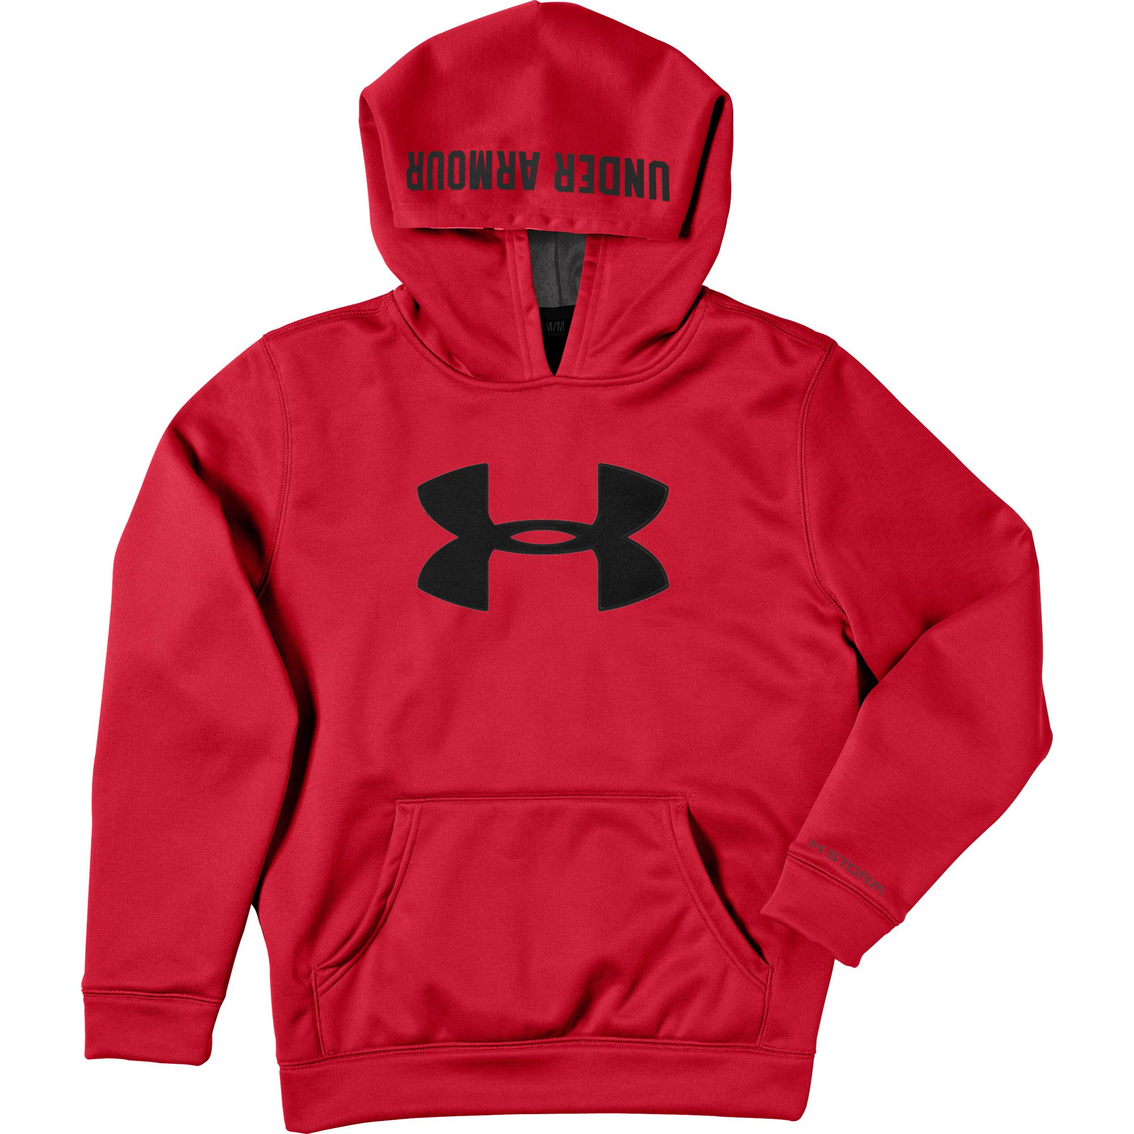 under armor hoodies for boys